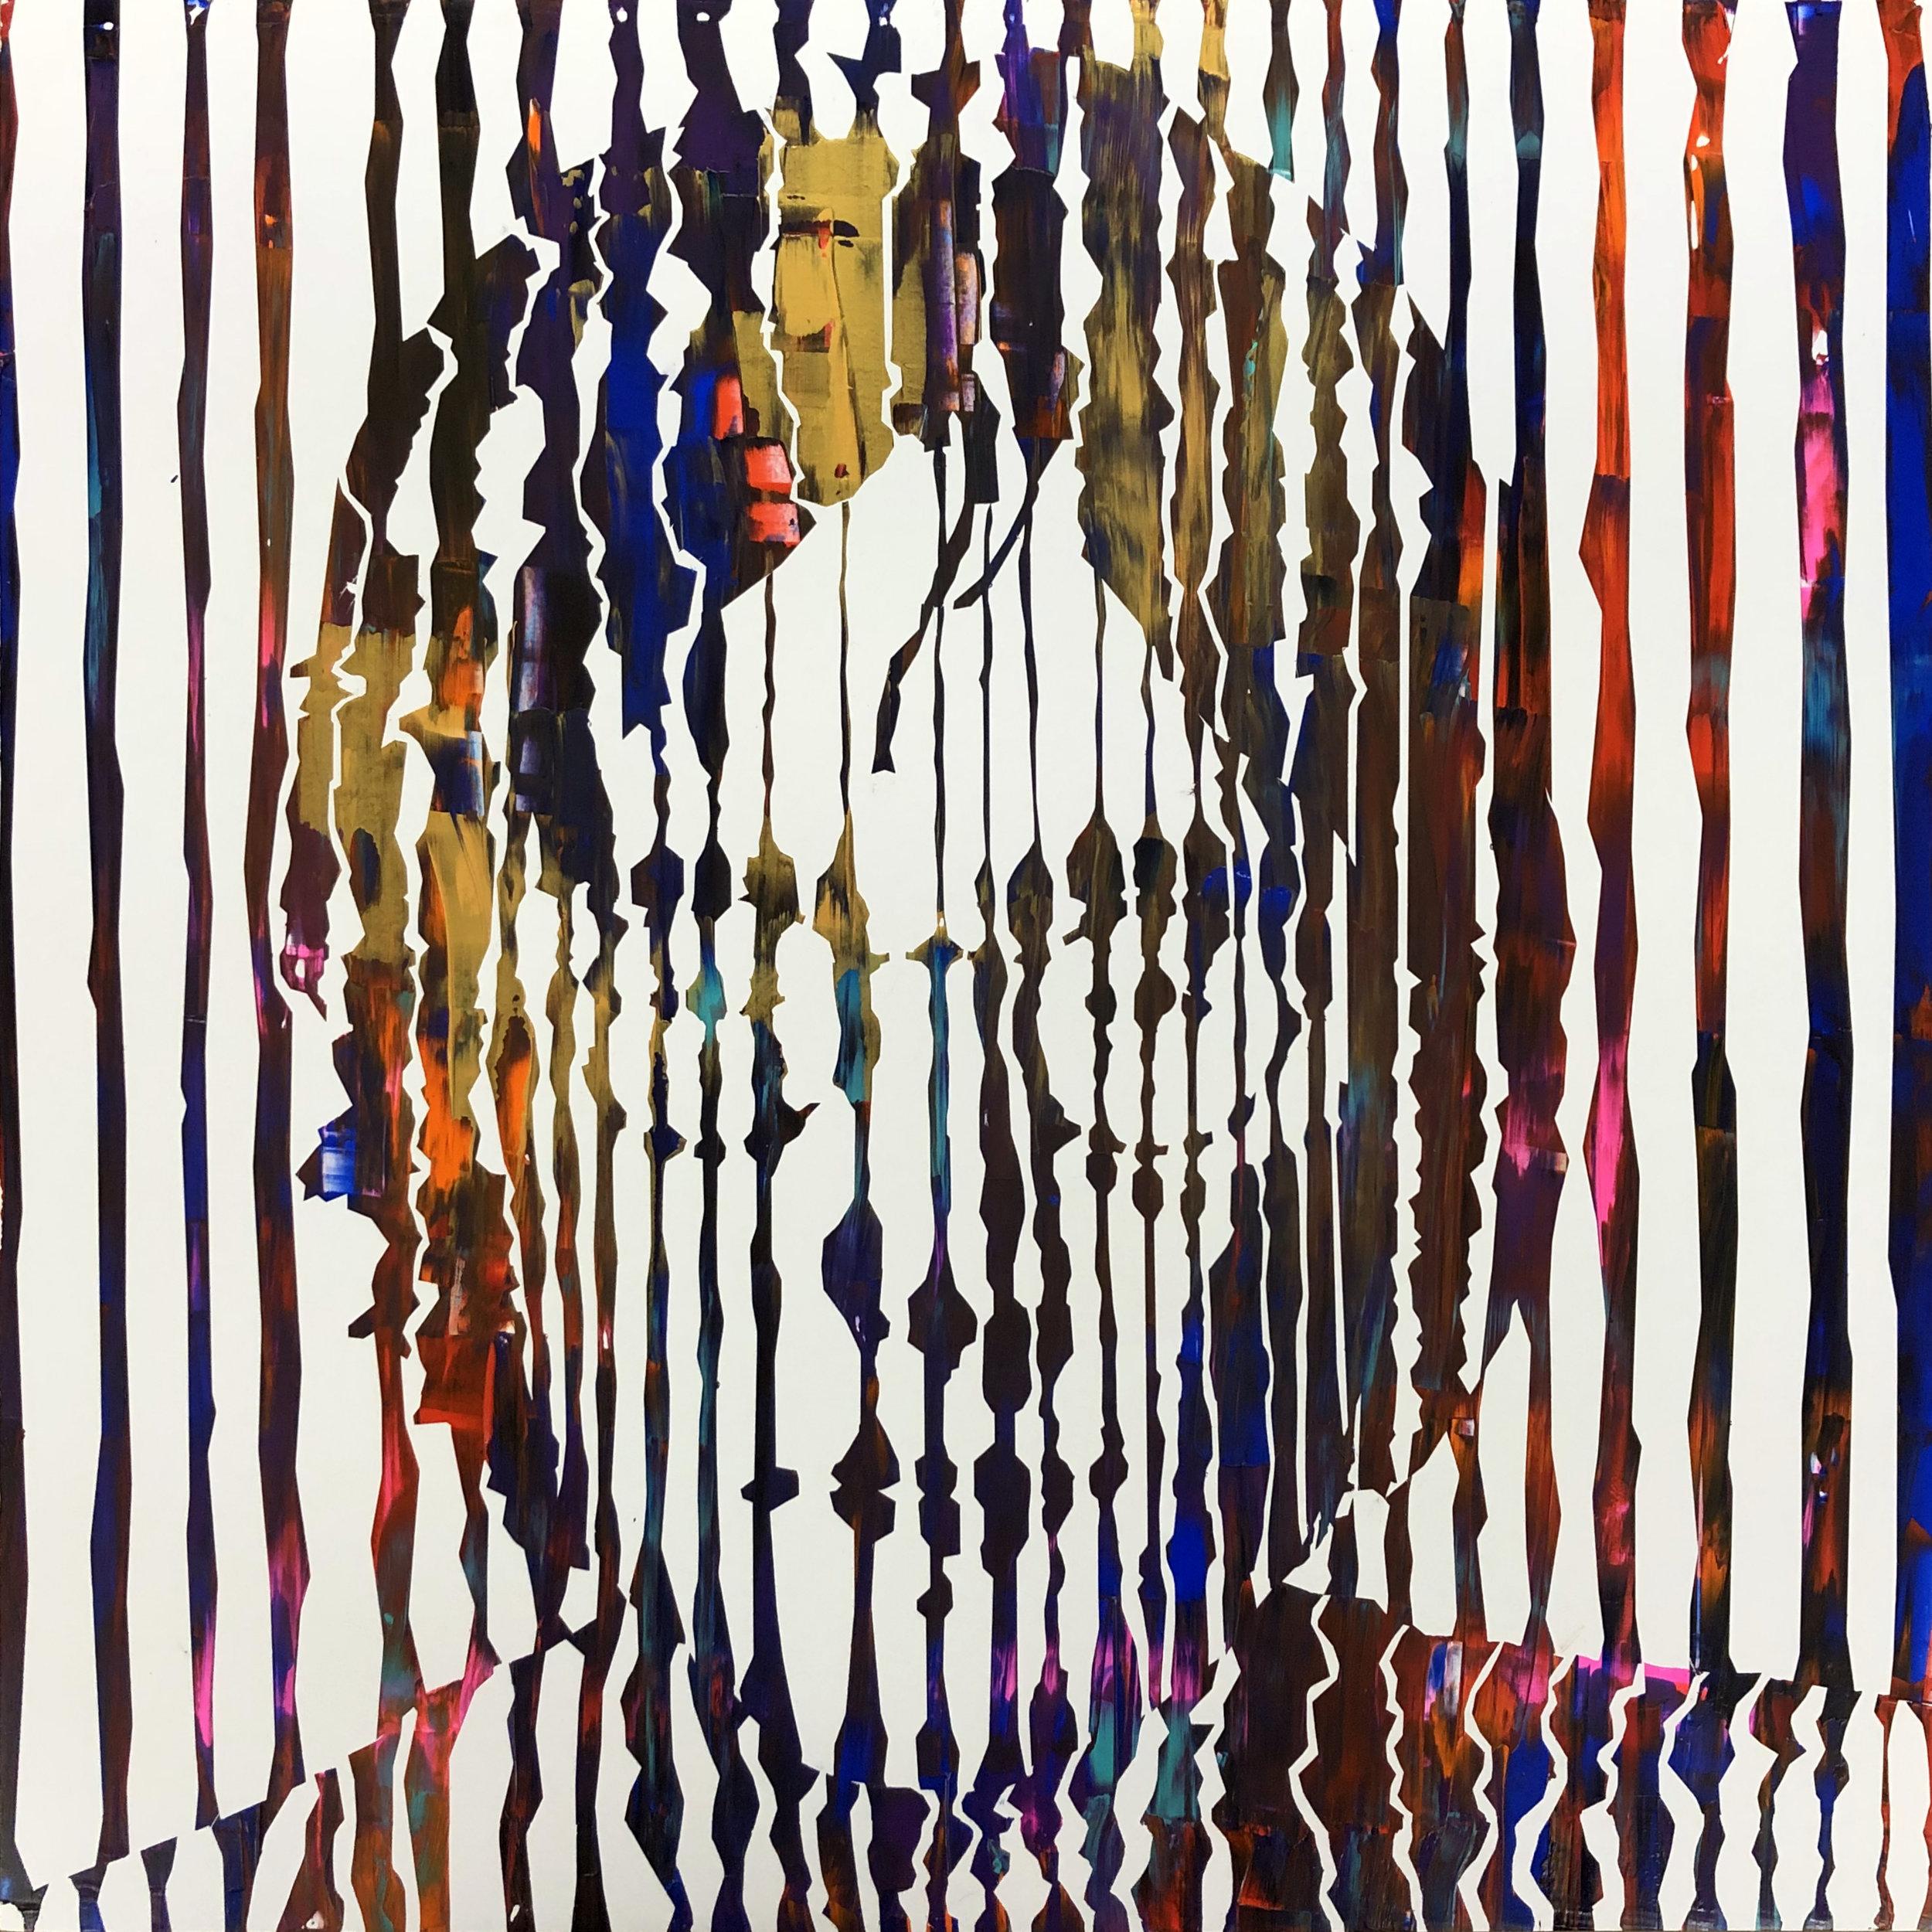 Sean Christopher Ward - Lennon III - Acrylic on Wood Panel - 16x16x1.5 - 2018 - 500.jpg